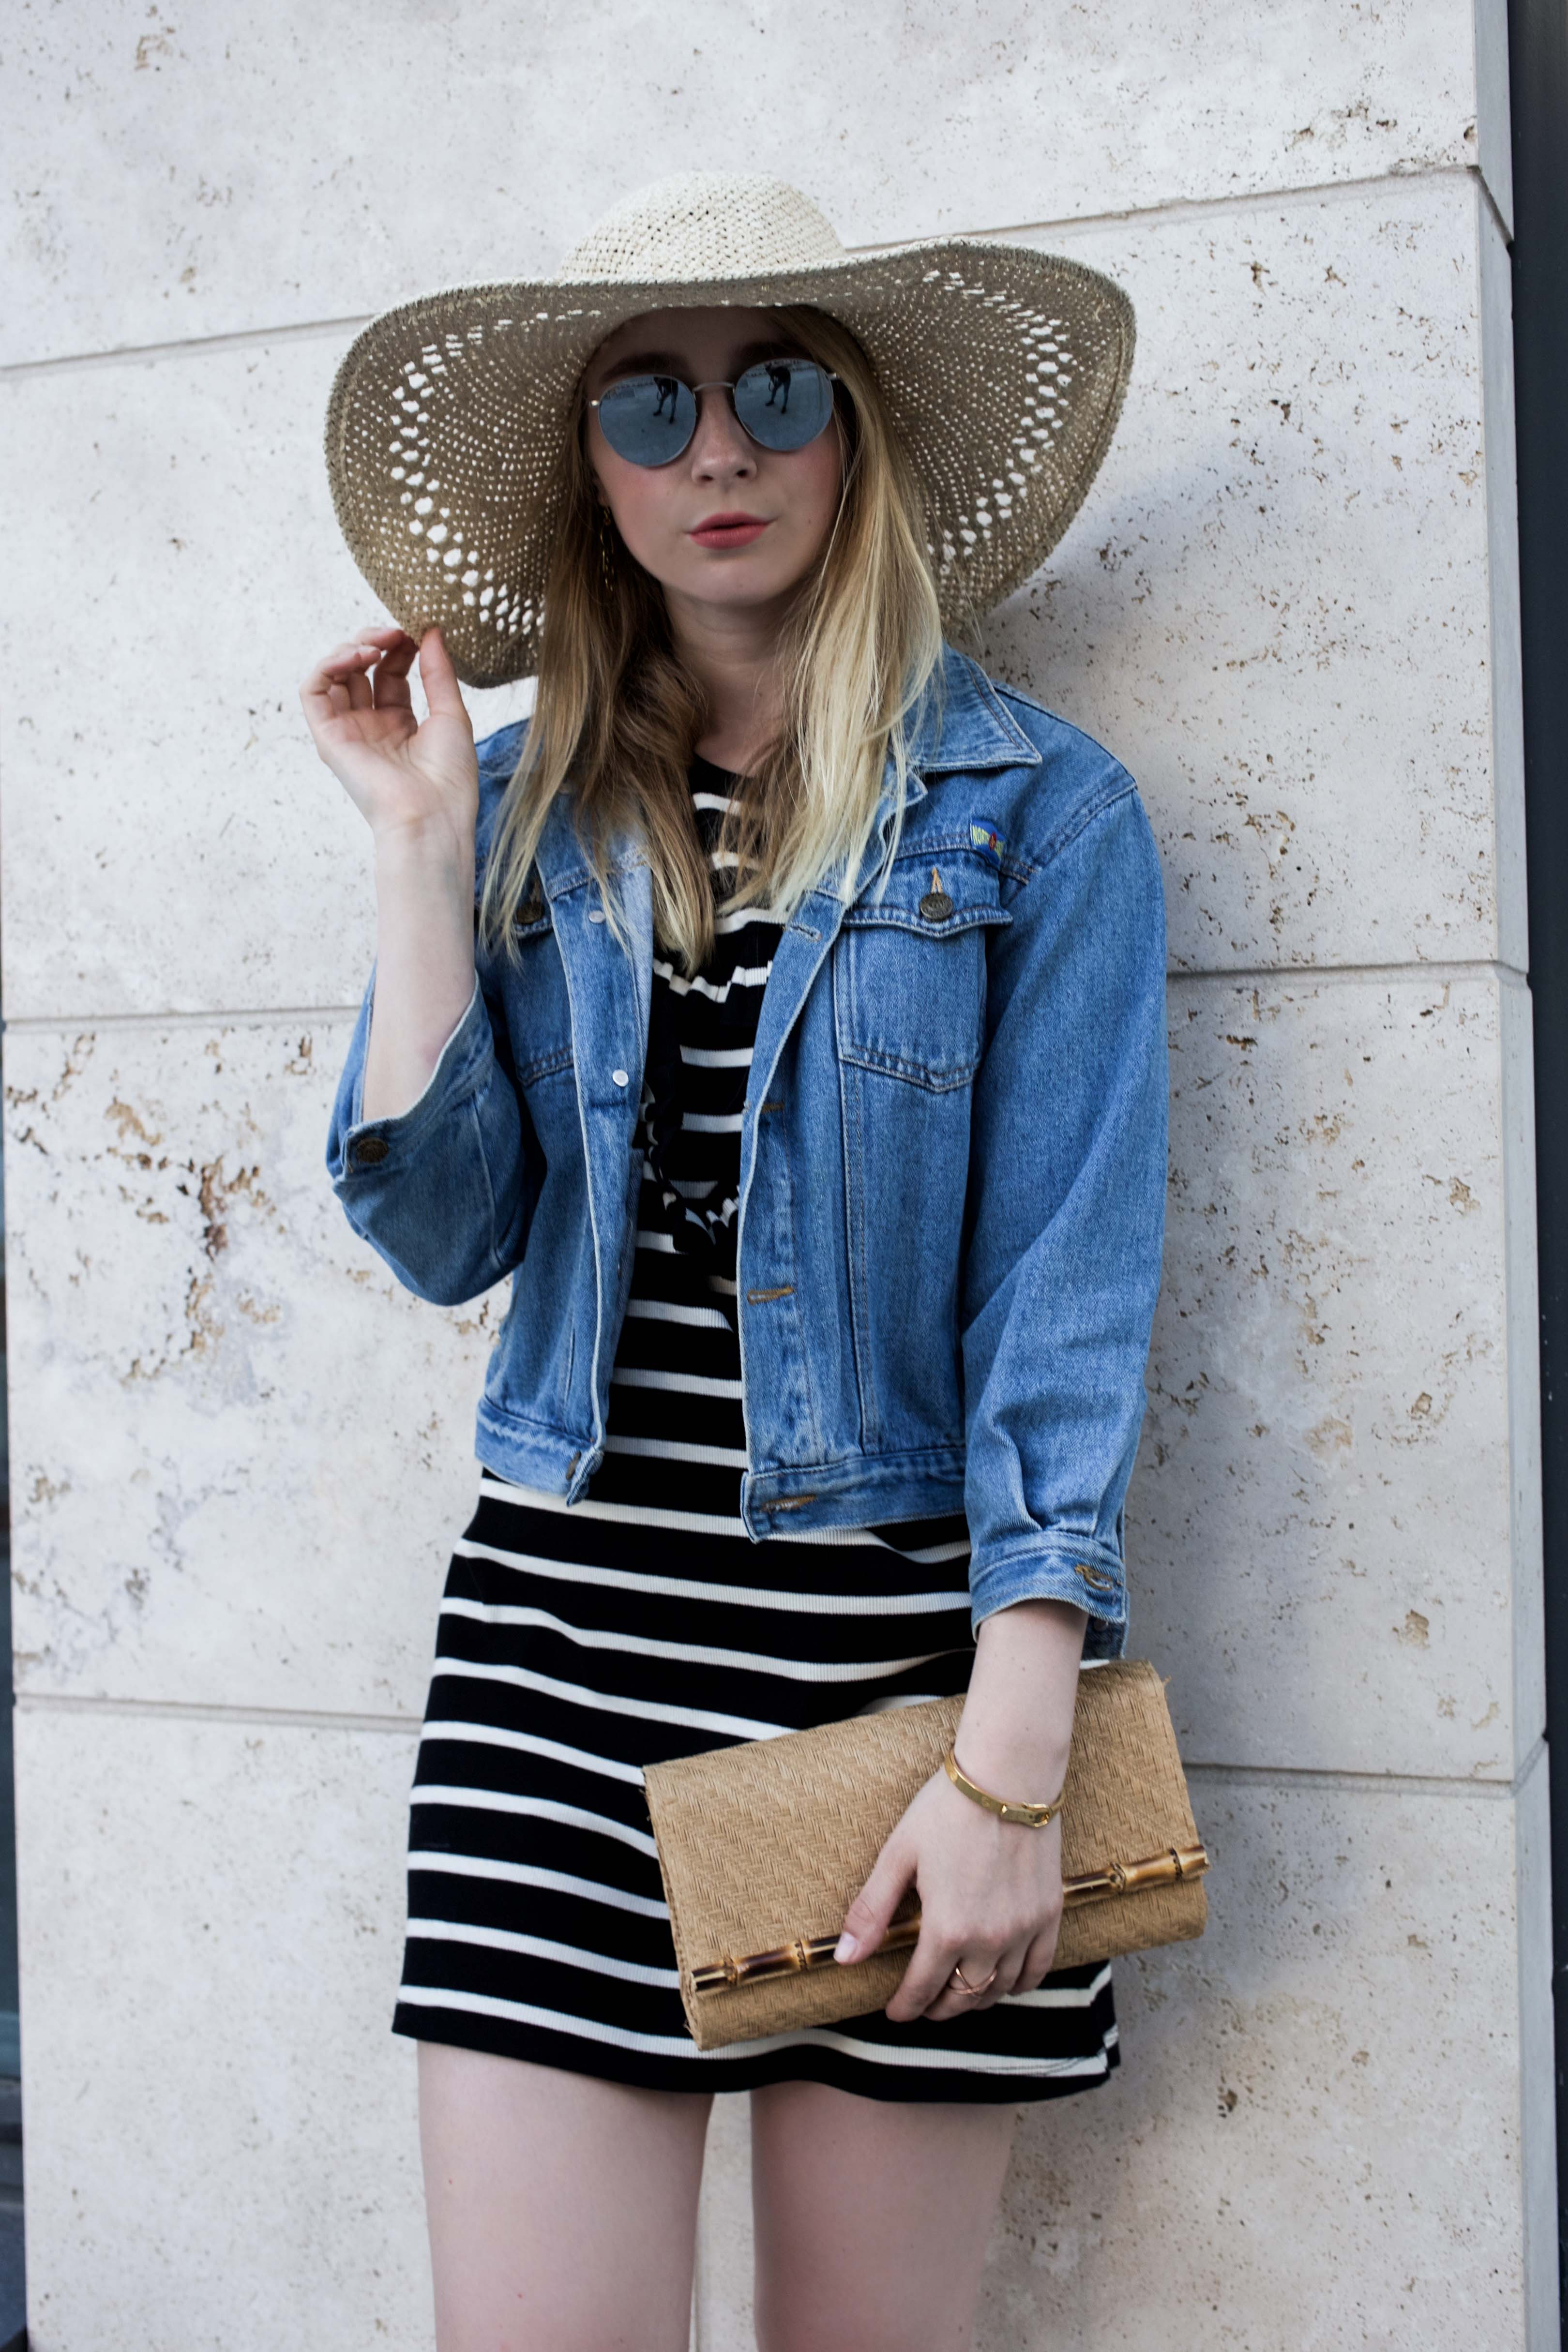 modeblog-fashionblog-berlin-köln-cologne-sonnenhut-outfit-fashion-lifestyle-sommerloo-7